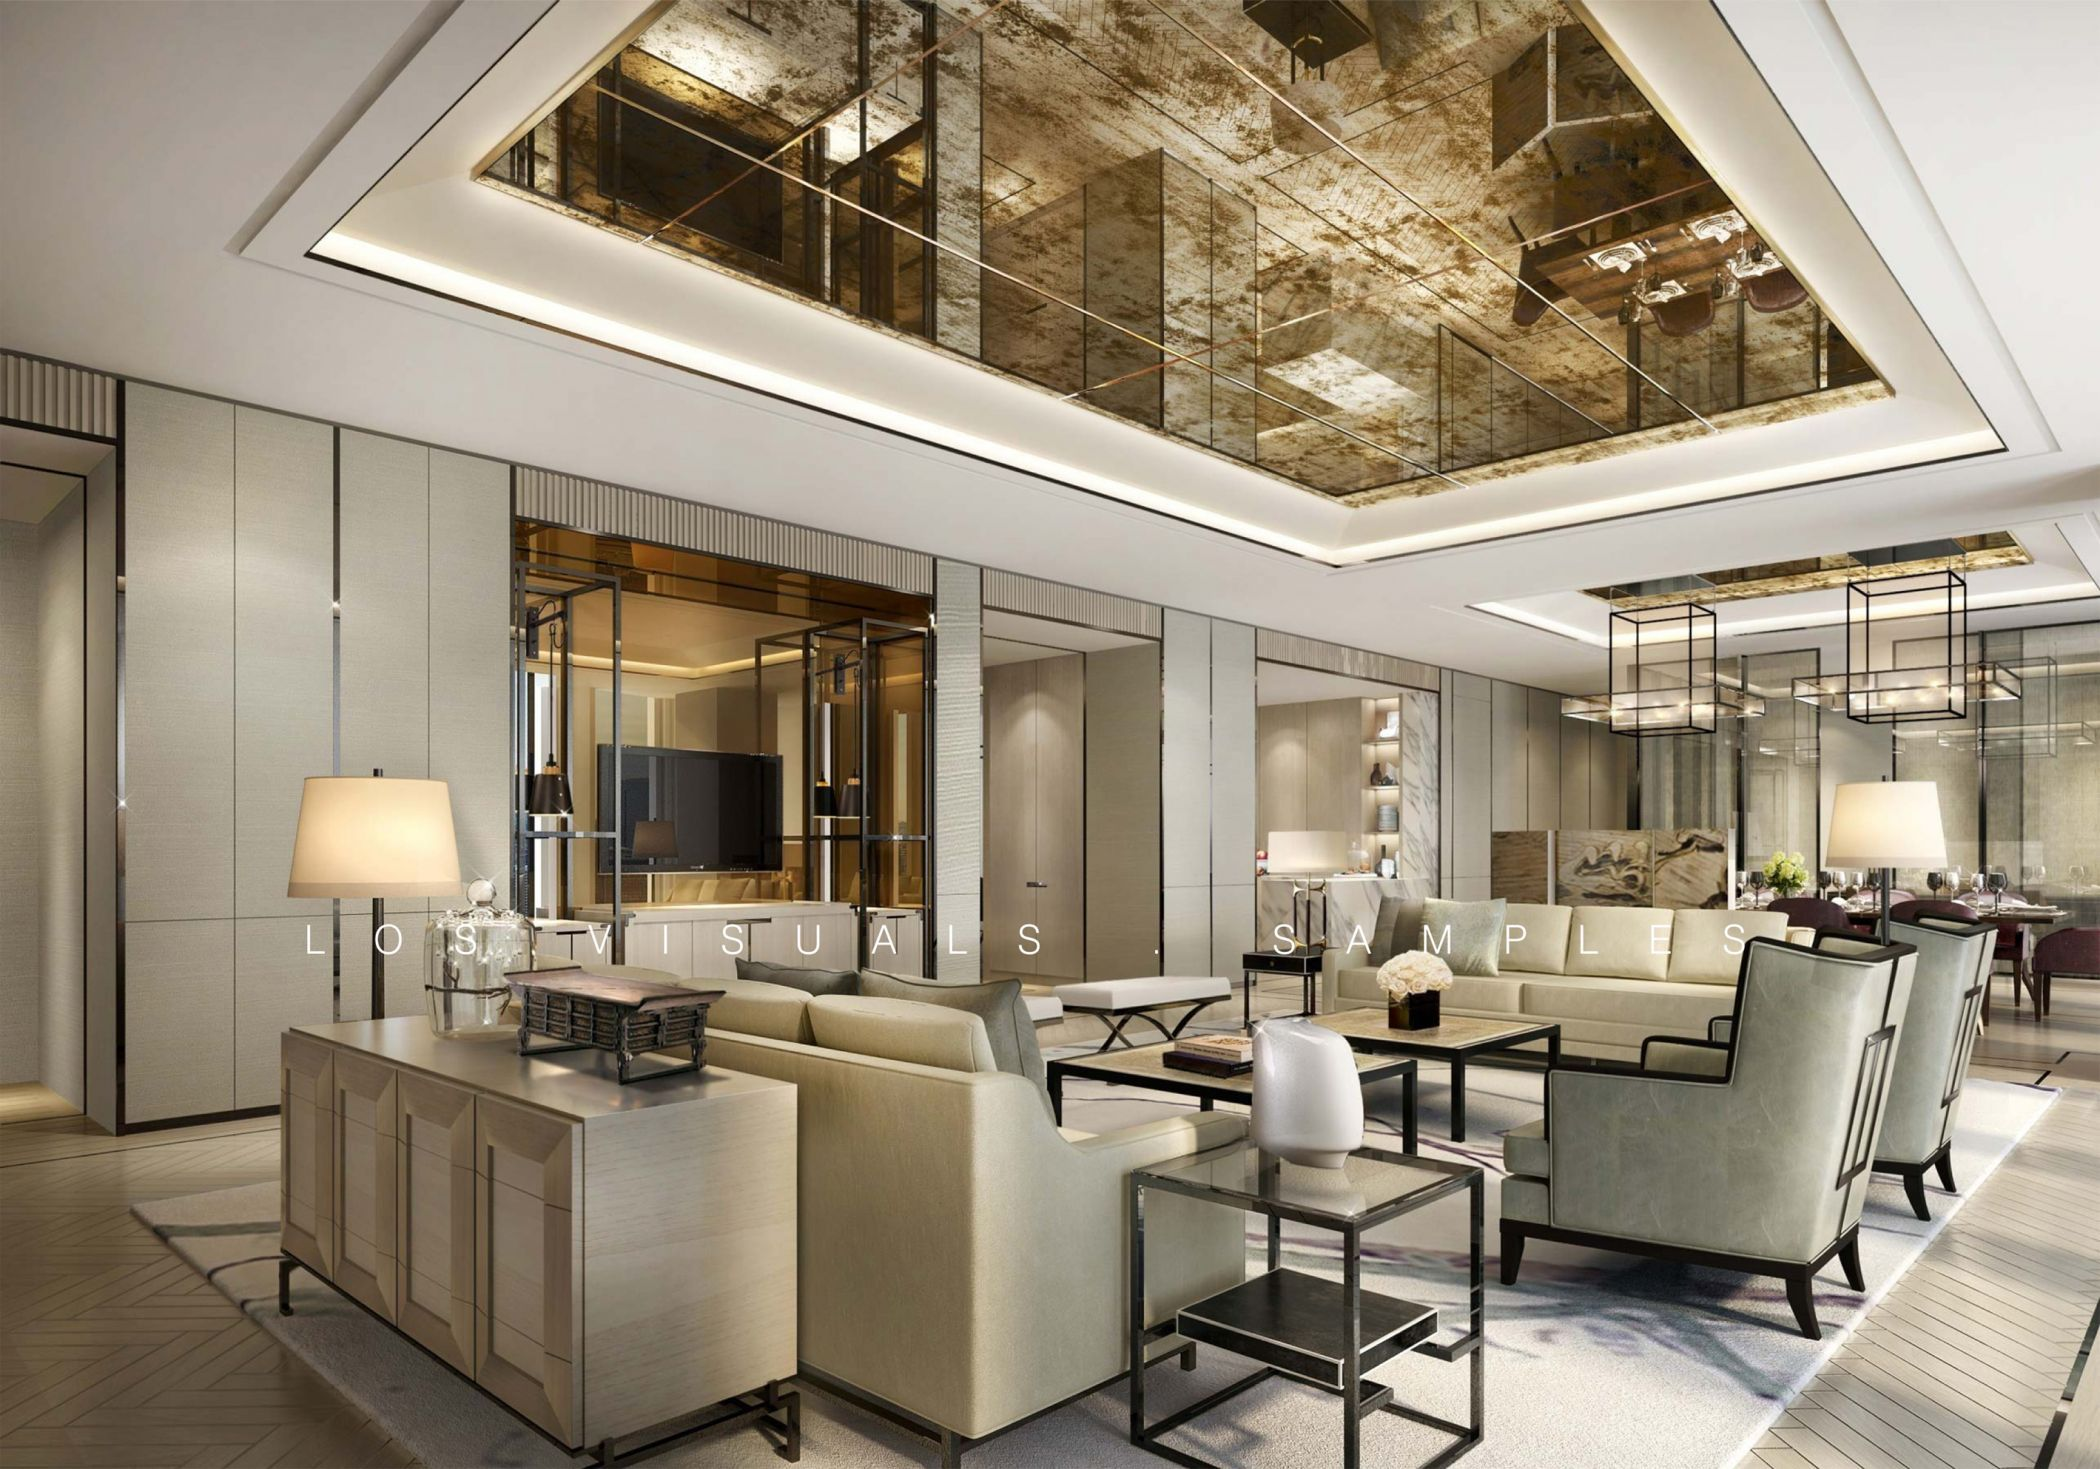 award winning interior design company architectural rendering rh pinterest com